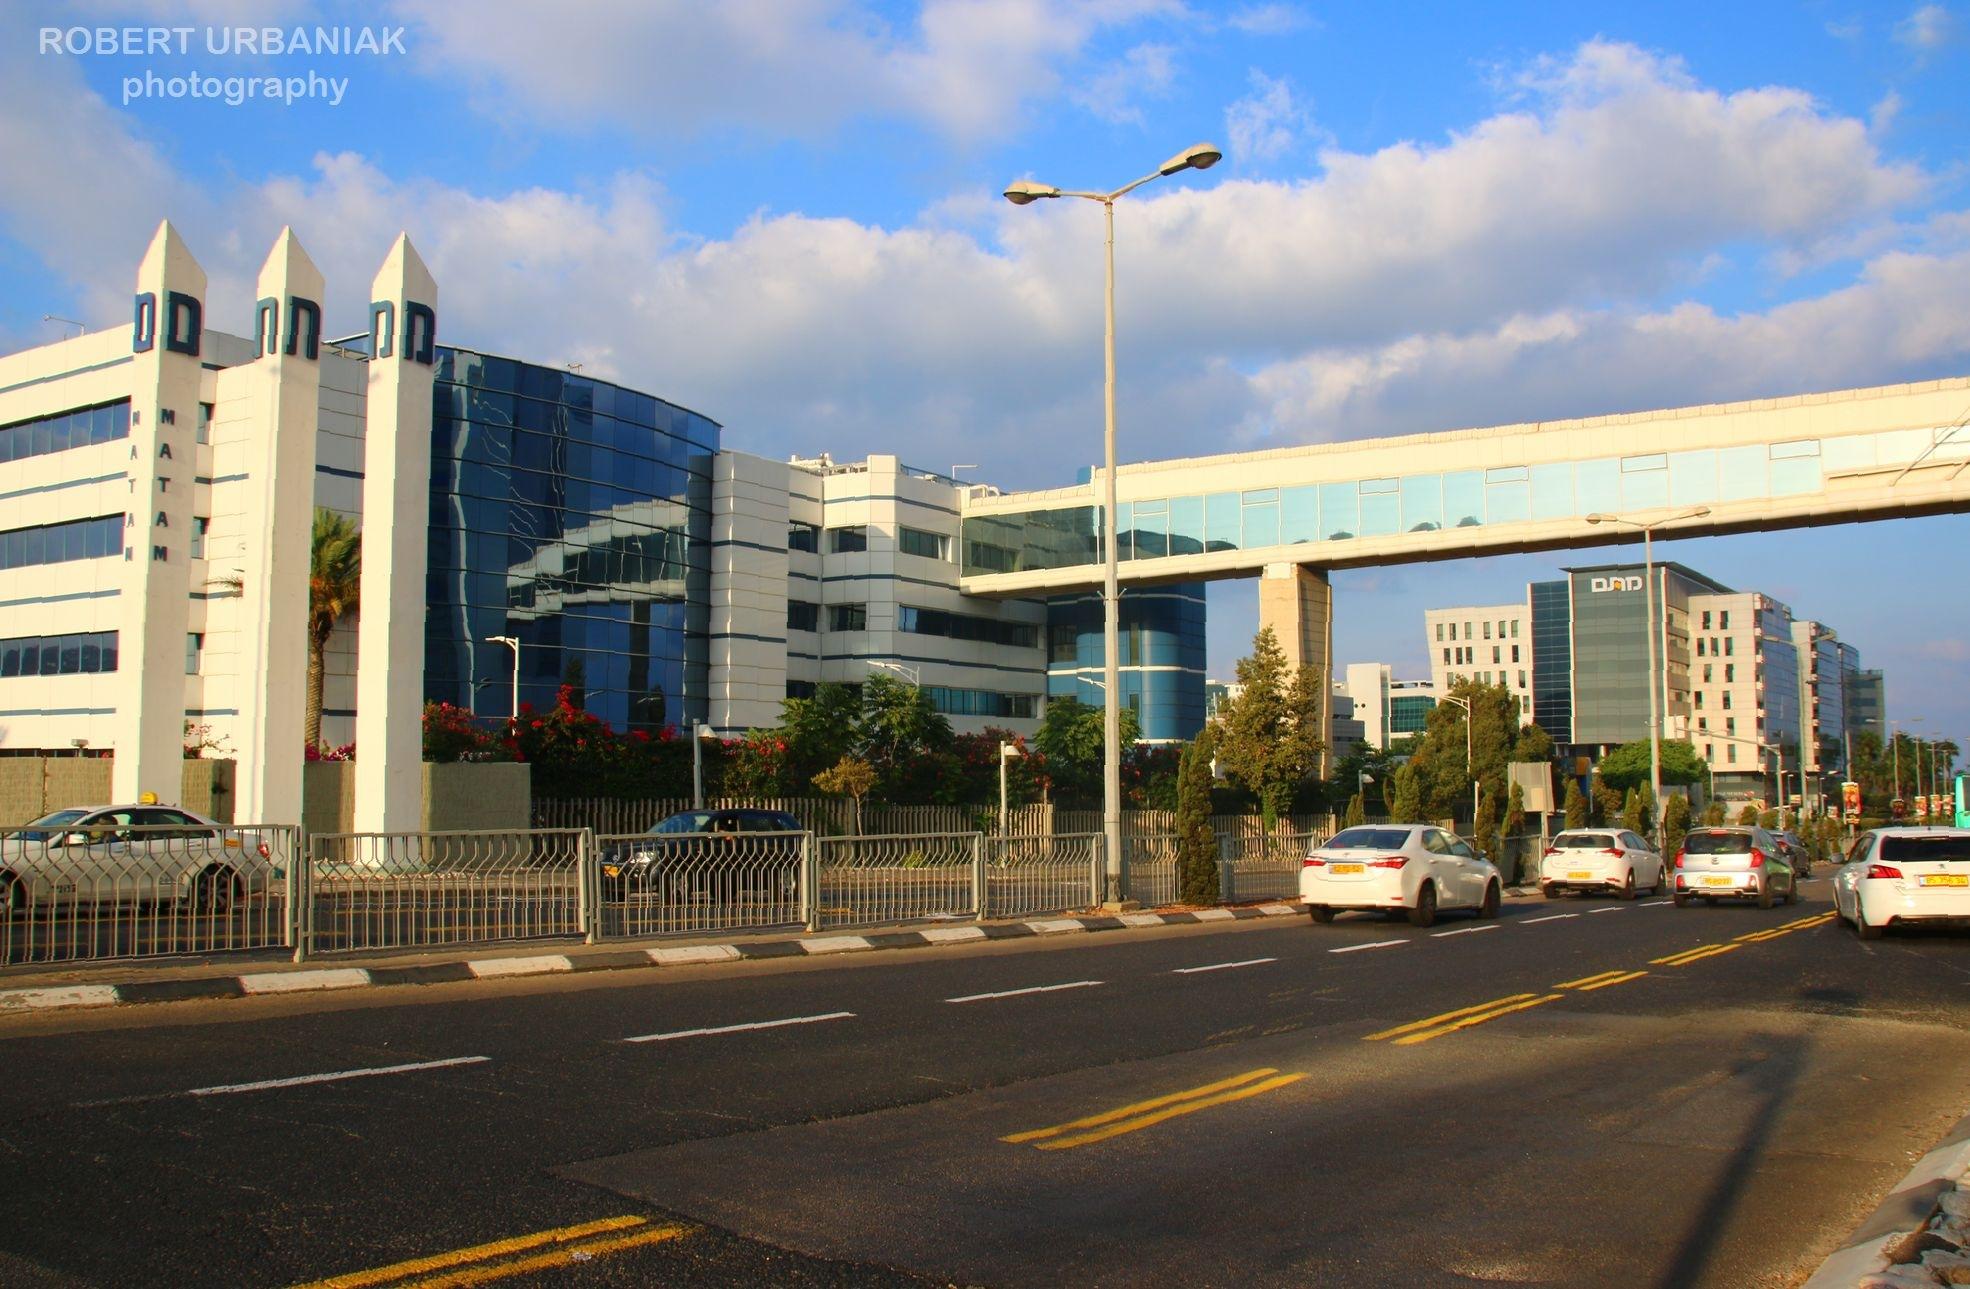 Intel building by Robert Urbaniak